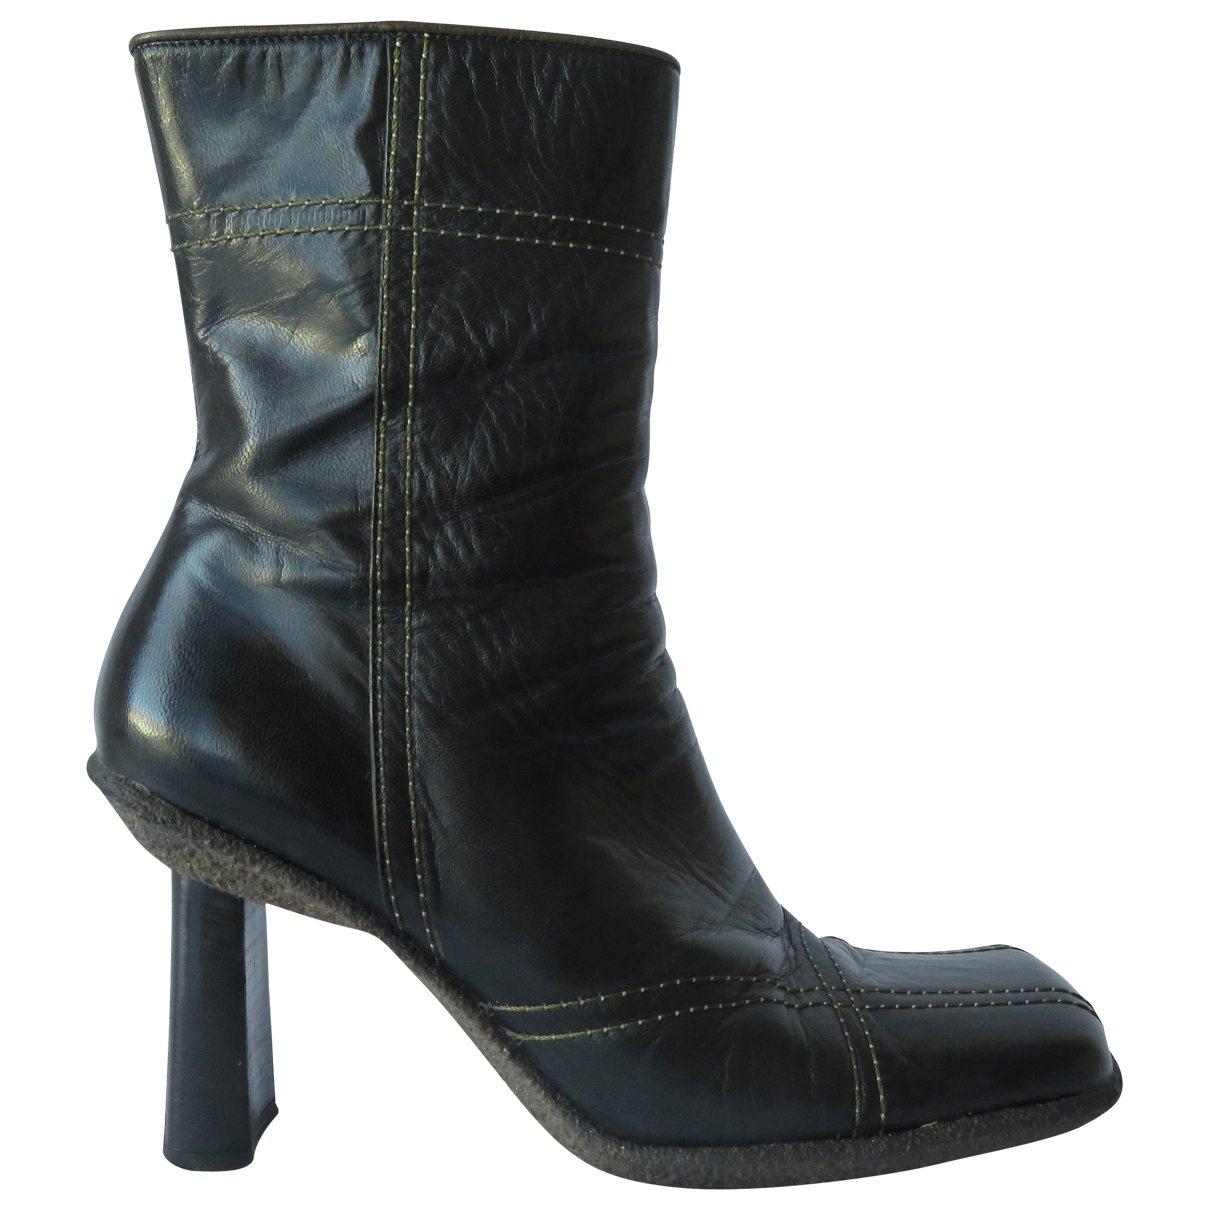 Hugo Boss \N Black Leather Boots for Women 38.5 EU